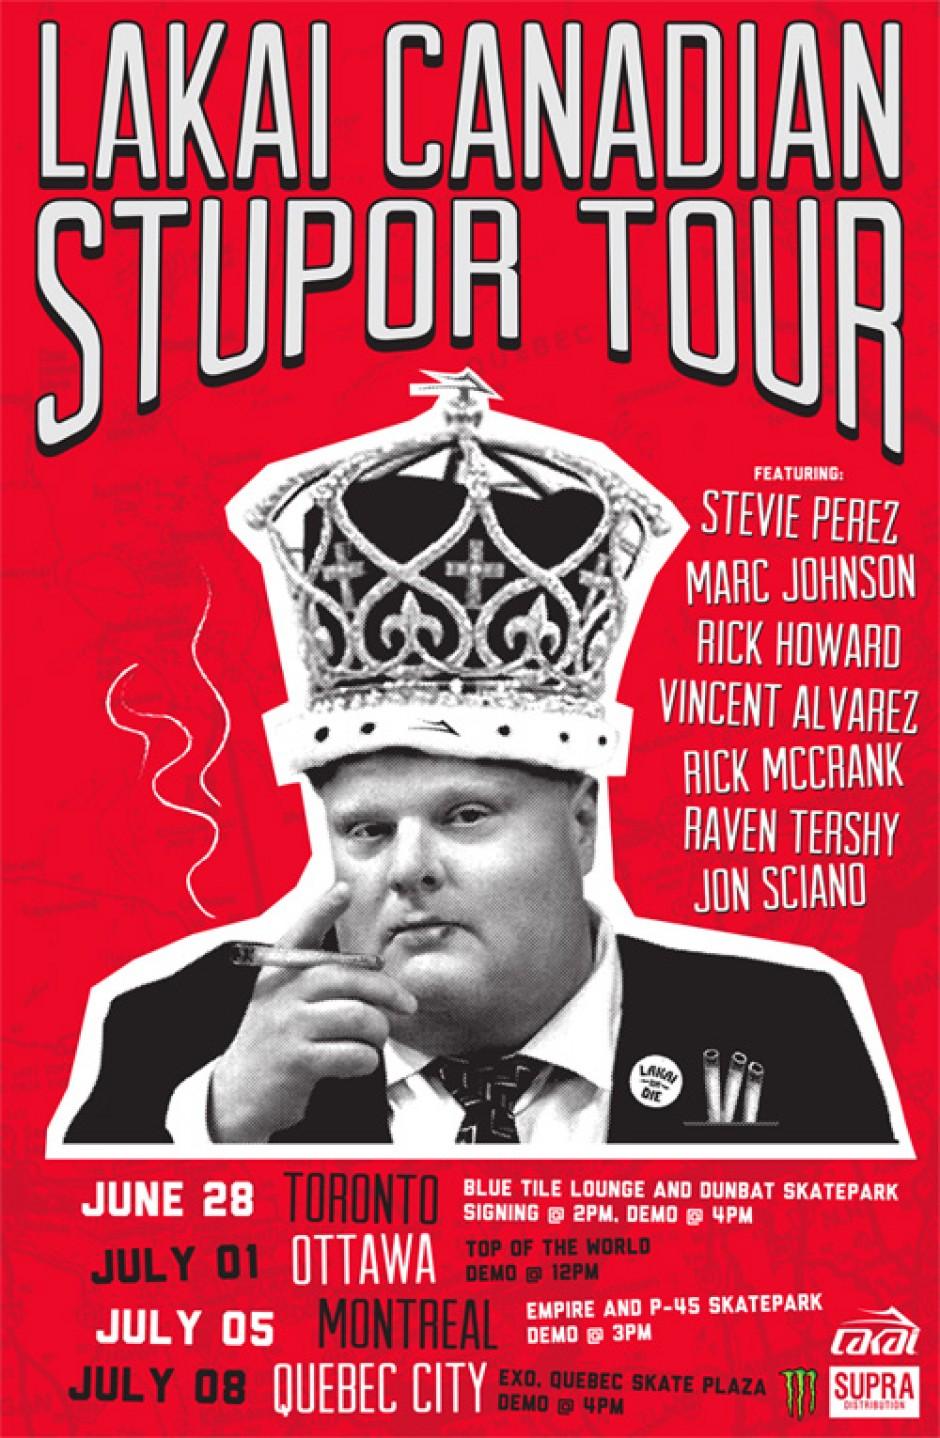 Lakai Canadian Stupor Tour